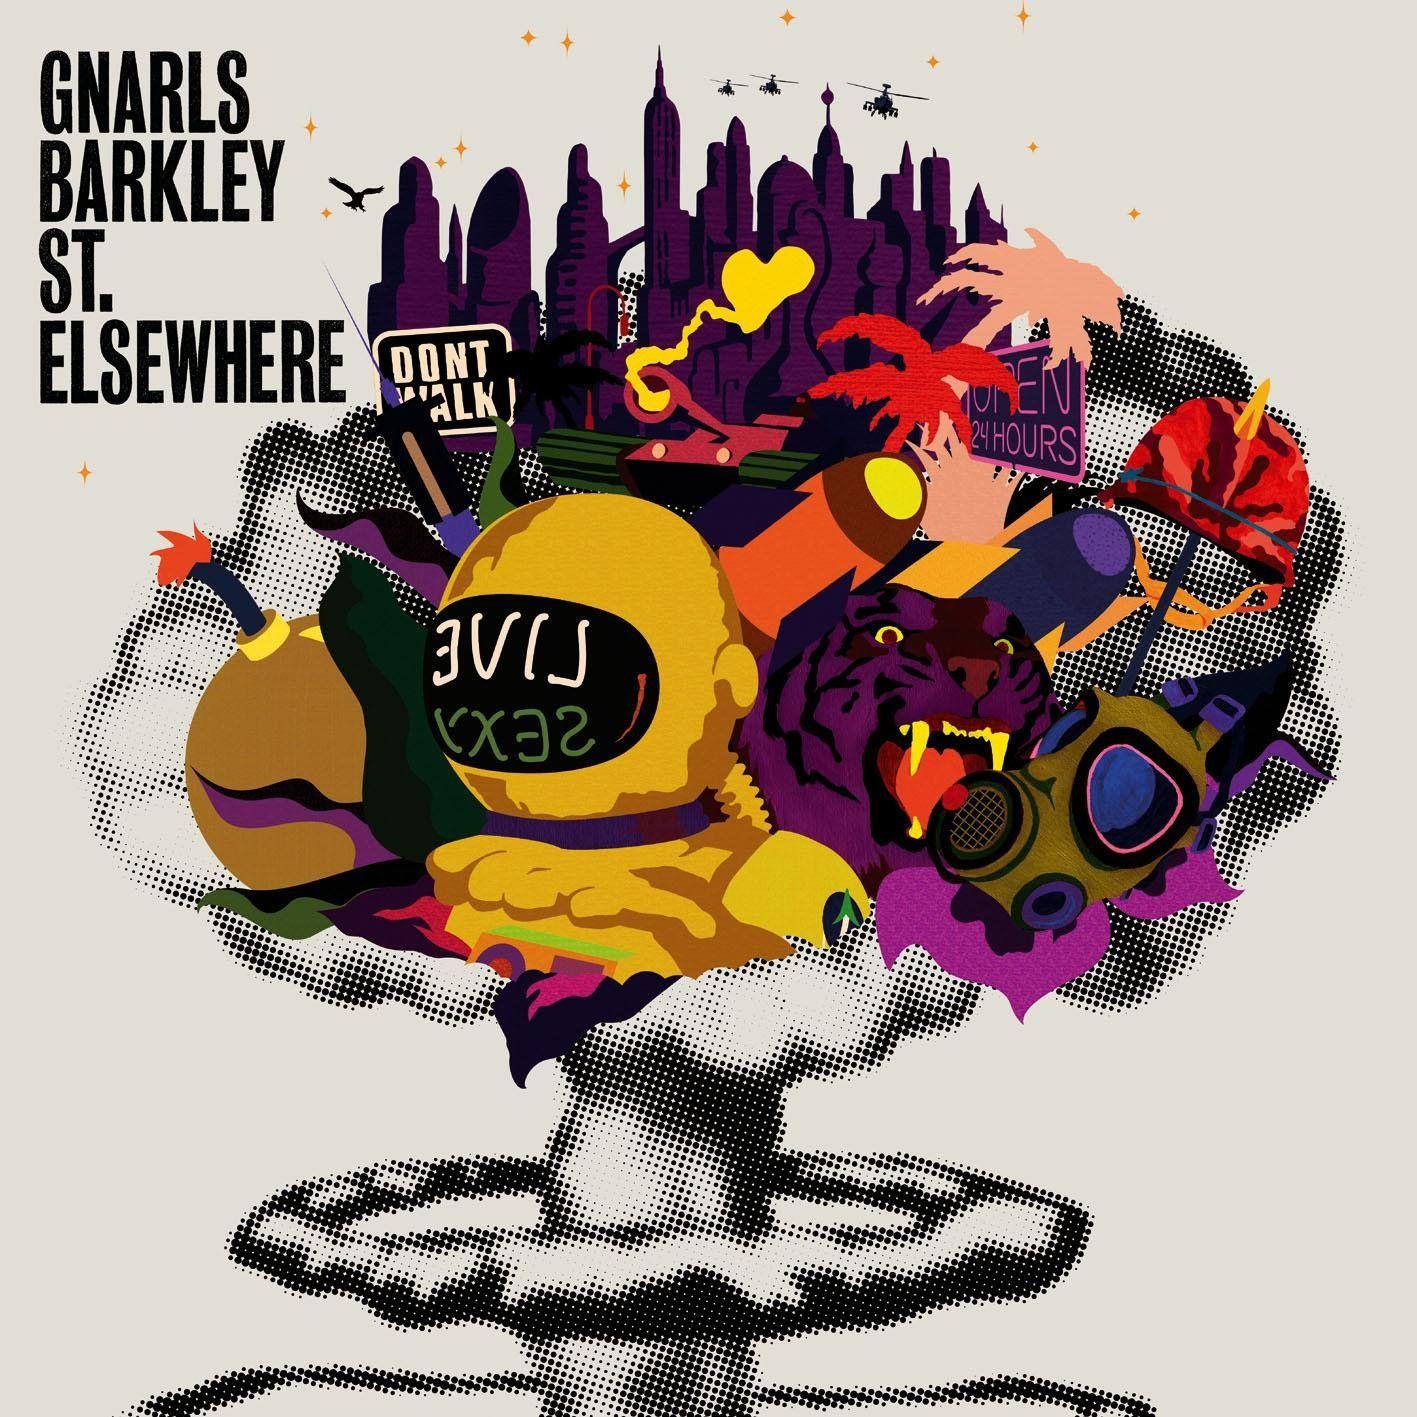 Gnarls Barkley - St. Elsewhere album cover